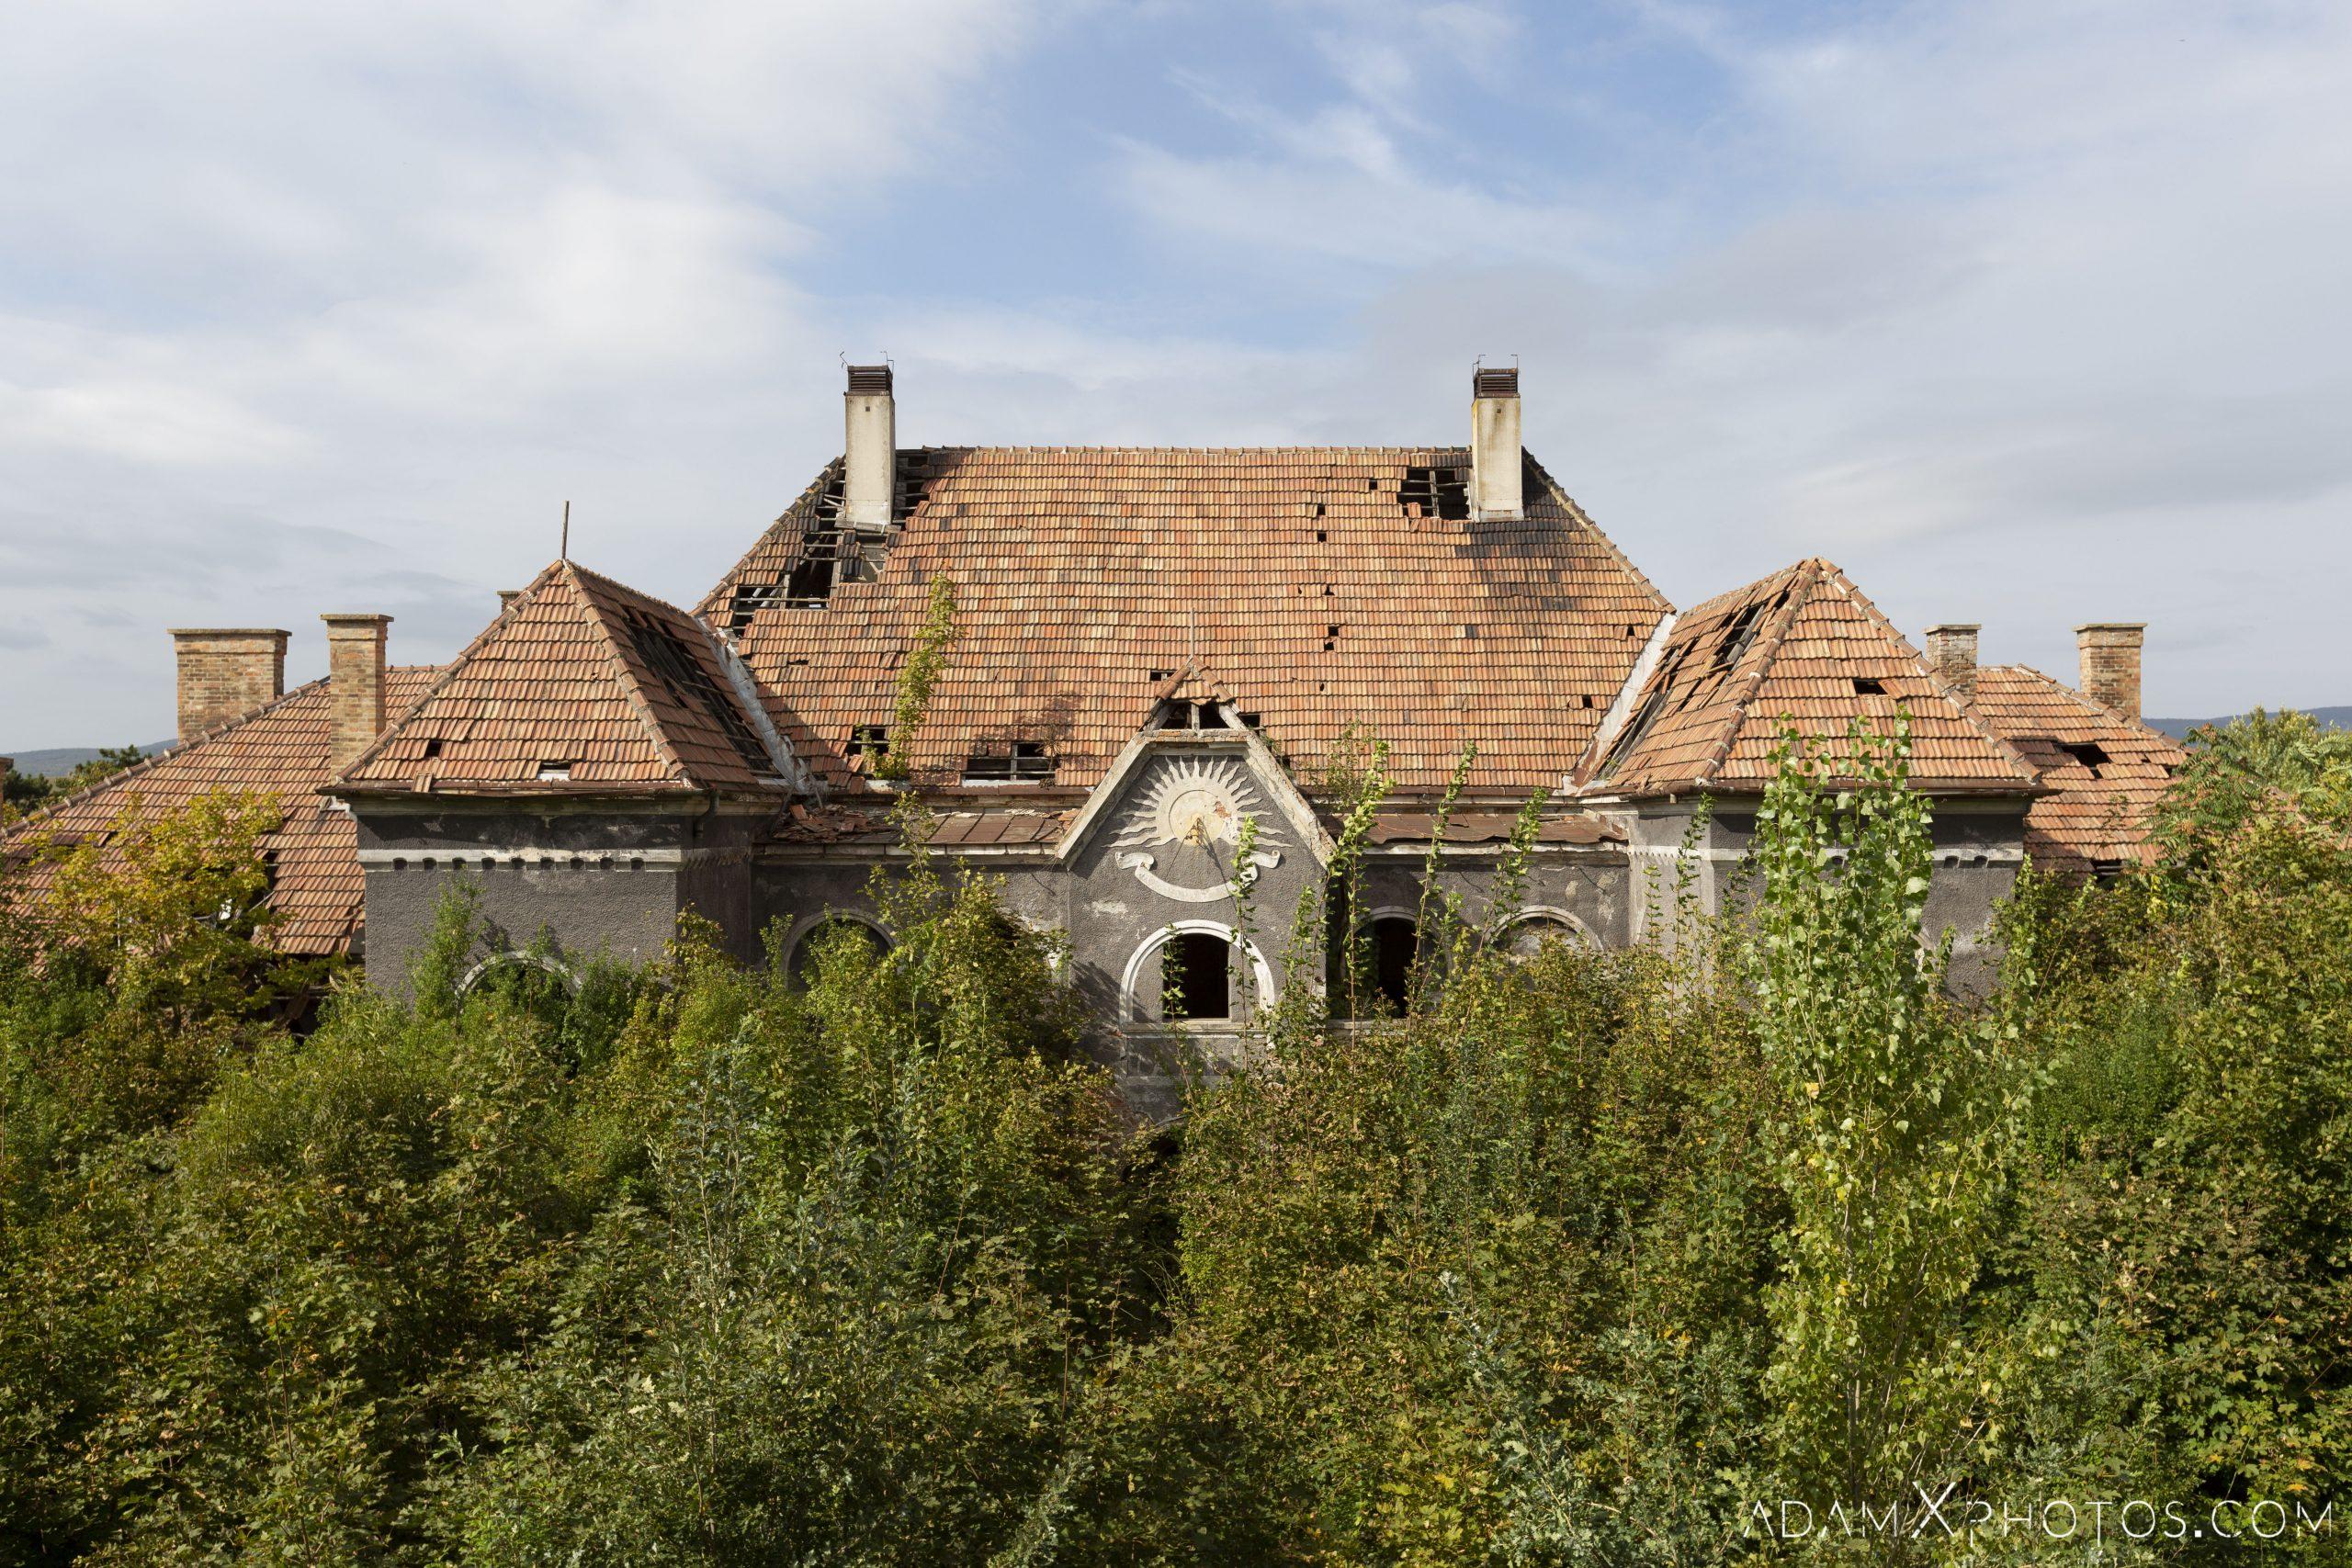 Exterior external Hajmaskér Barracks Hungary Adam X Urbex Urban Exploration Access 2018 Abandoned decay ruins lost forgotten derelict location creepy haunting eerie